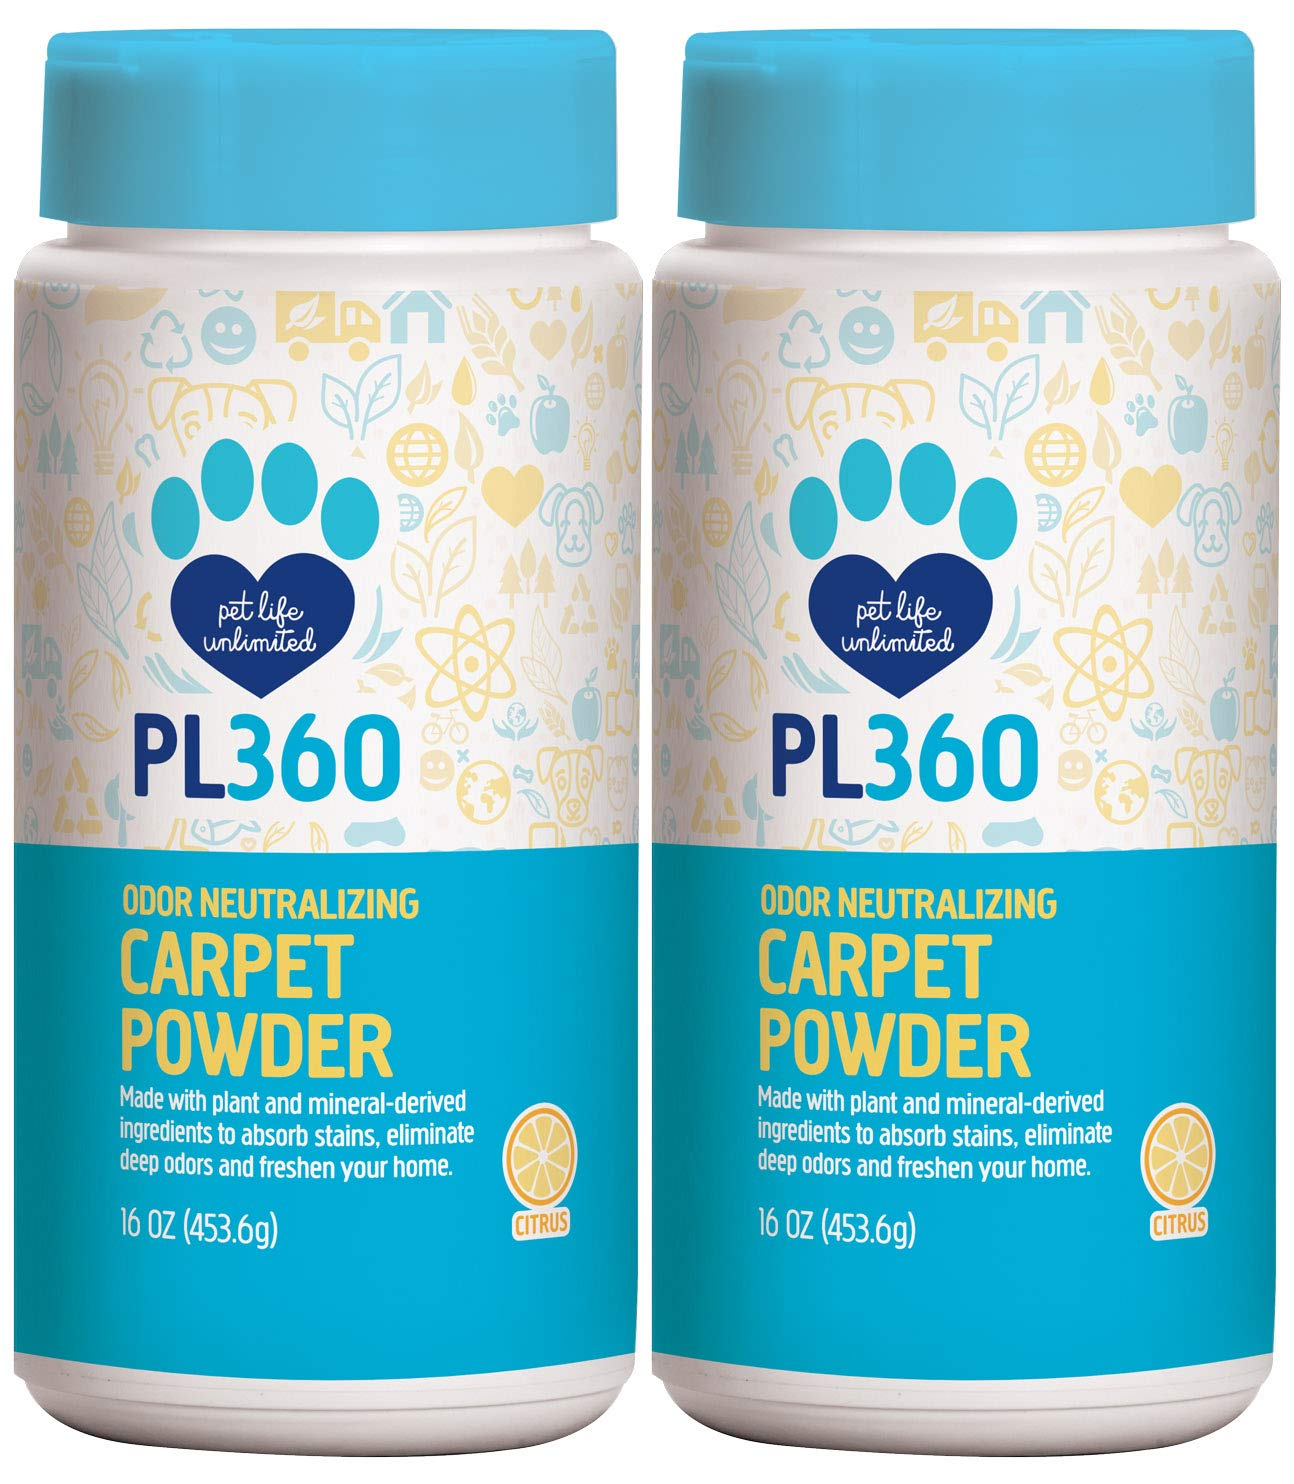 PL360 Odor Neutralizing Carpet Powder, 16oz